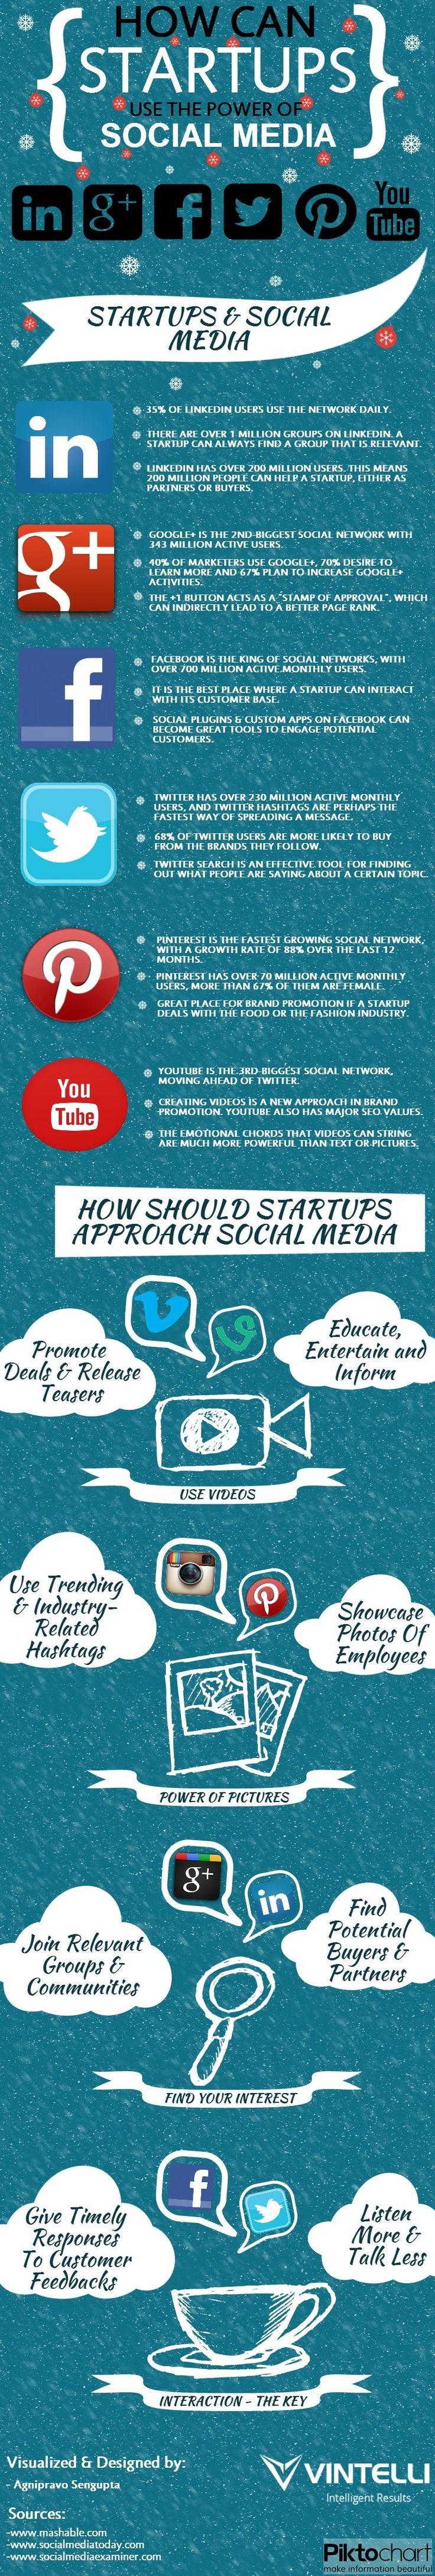 How Startups Can Use The Power Of Social Media #Infographic #socialmedia #entrepreneur